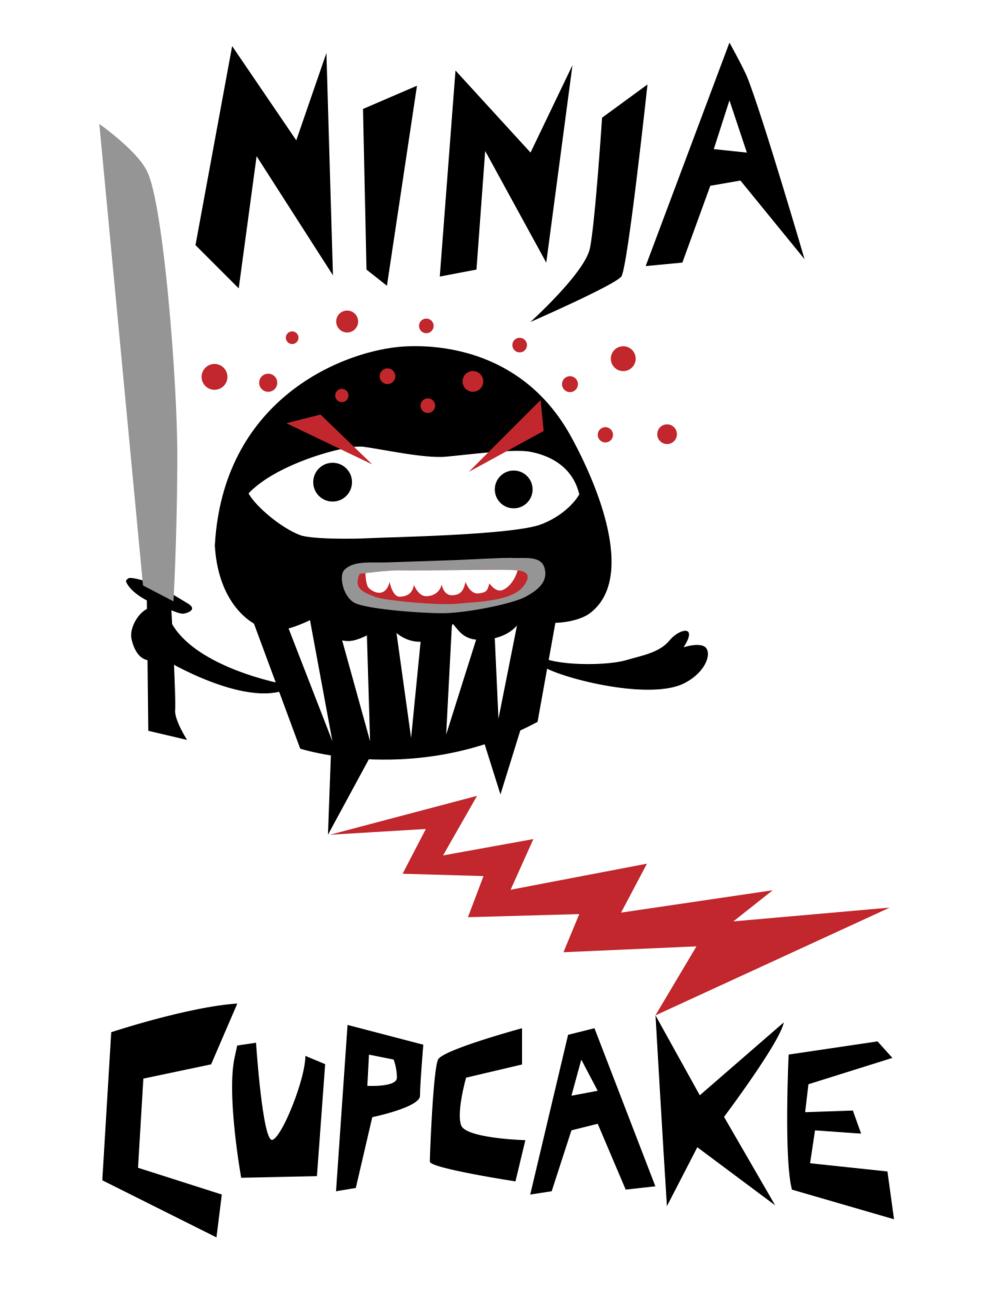 ninja_cupcake_type_andi_bird.png